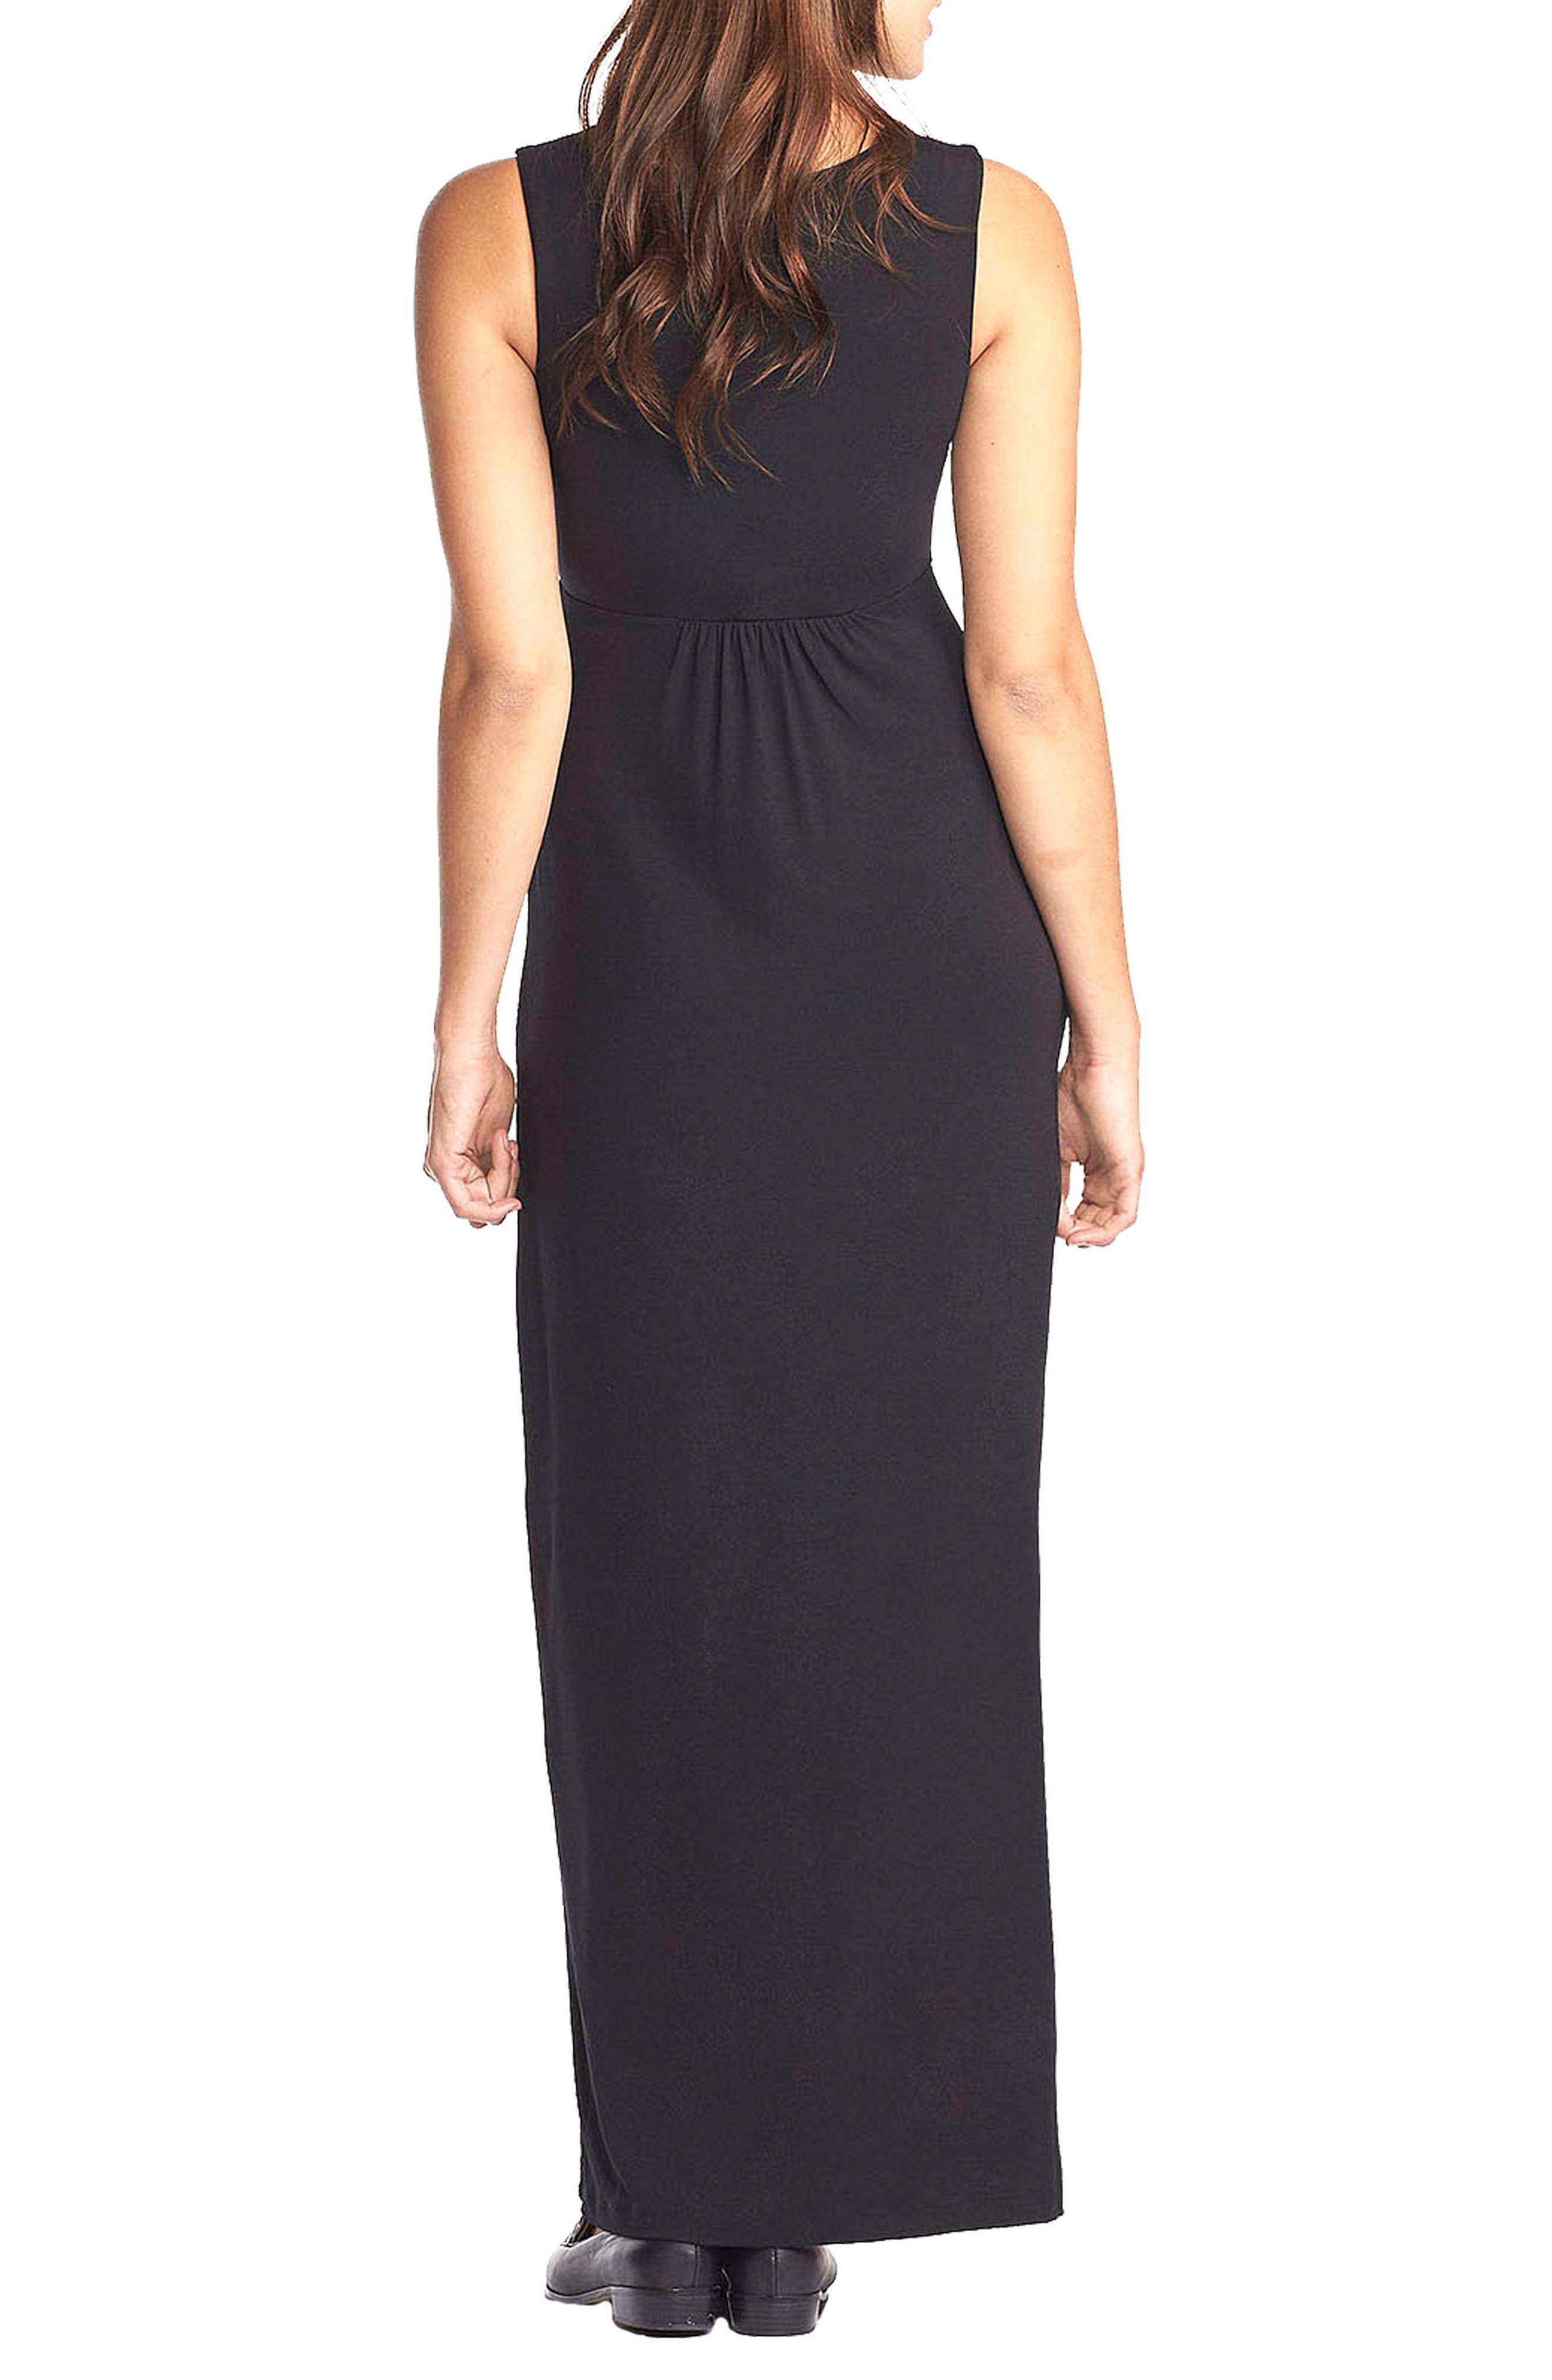 TART MATERNITY, 'Callie' Jersey Maxi Maternity Dress, Alternate thumbnail 2, color, BLACK